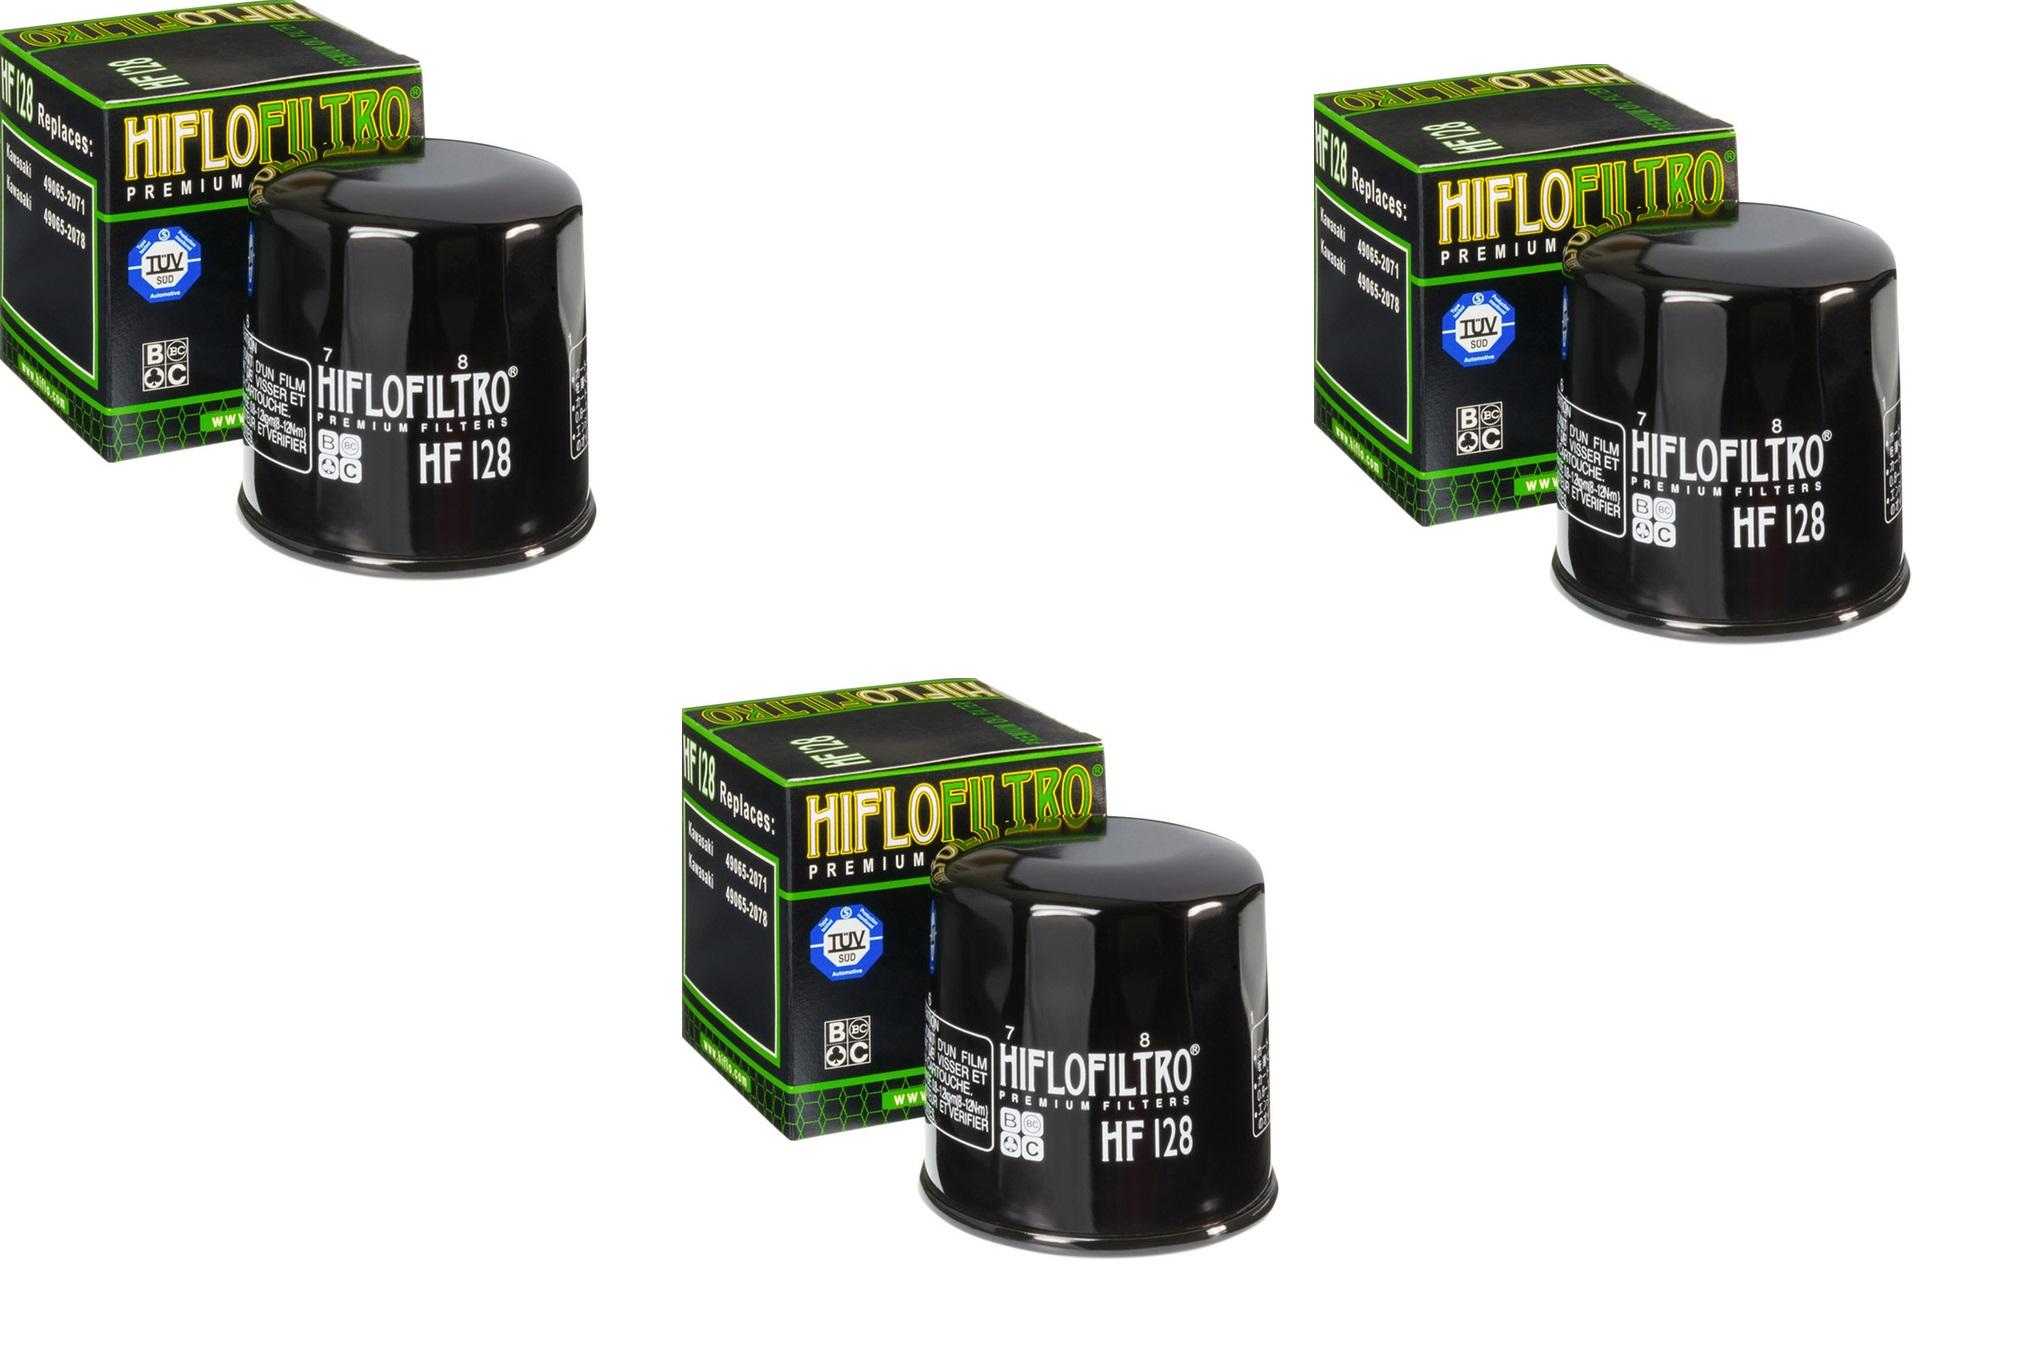 Hiflo UTV Oil Filter Set For Kawasaki Mule Pro FXT 15-16 HF129 3